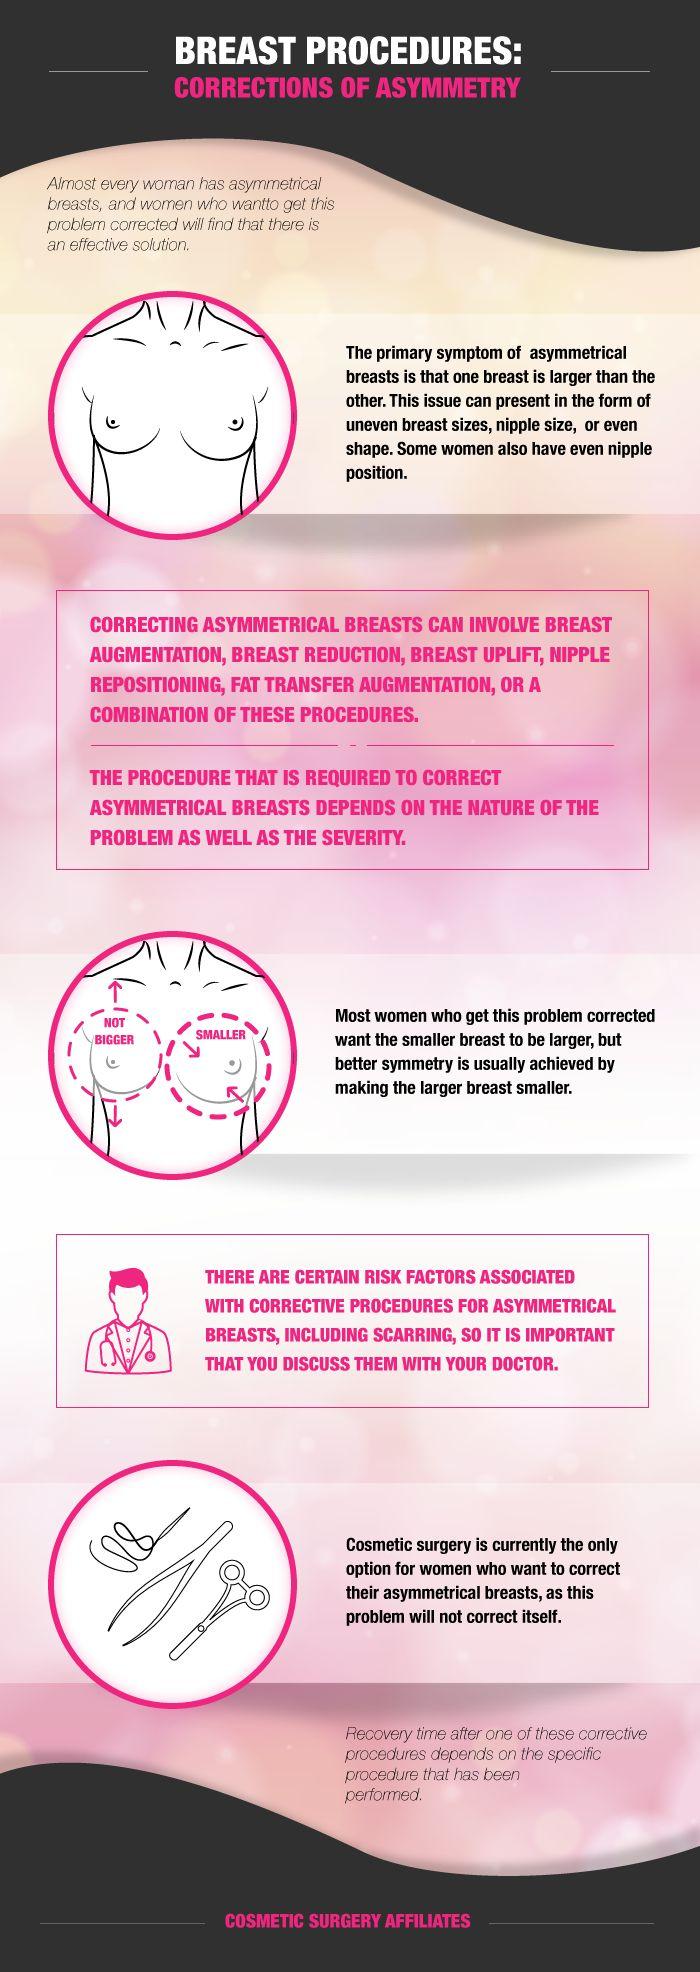 Statistics of breast asymmetry